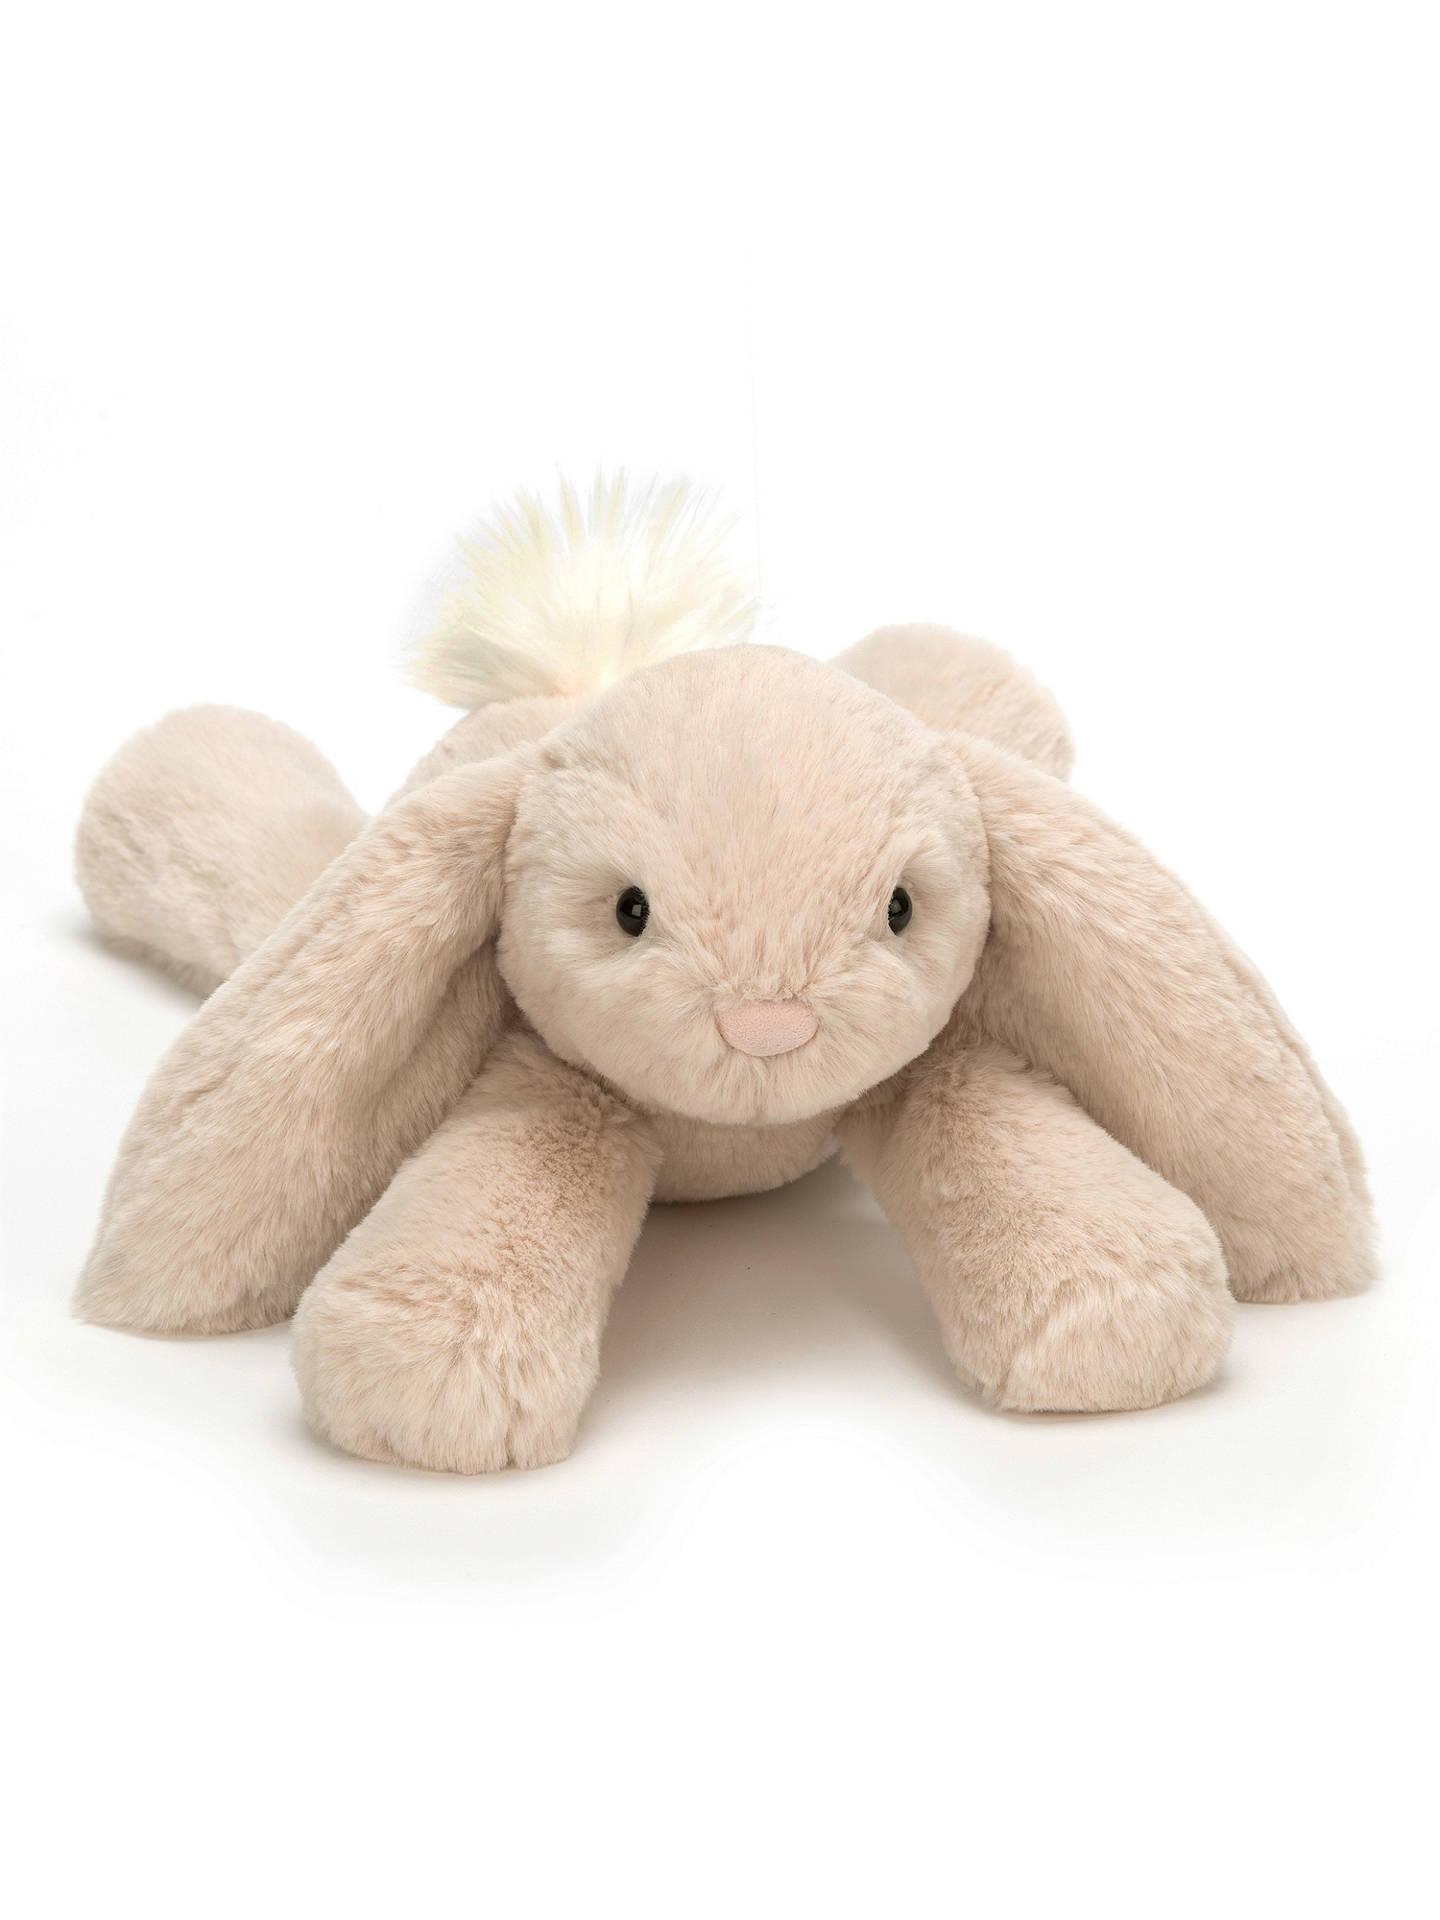 3bb1b9a461b ... Buy Jellycat Smudge Rabbit Soft Toy